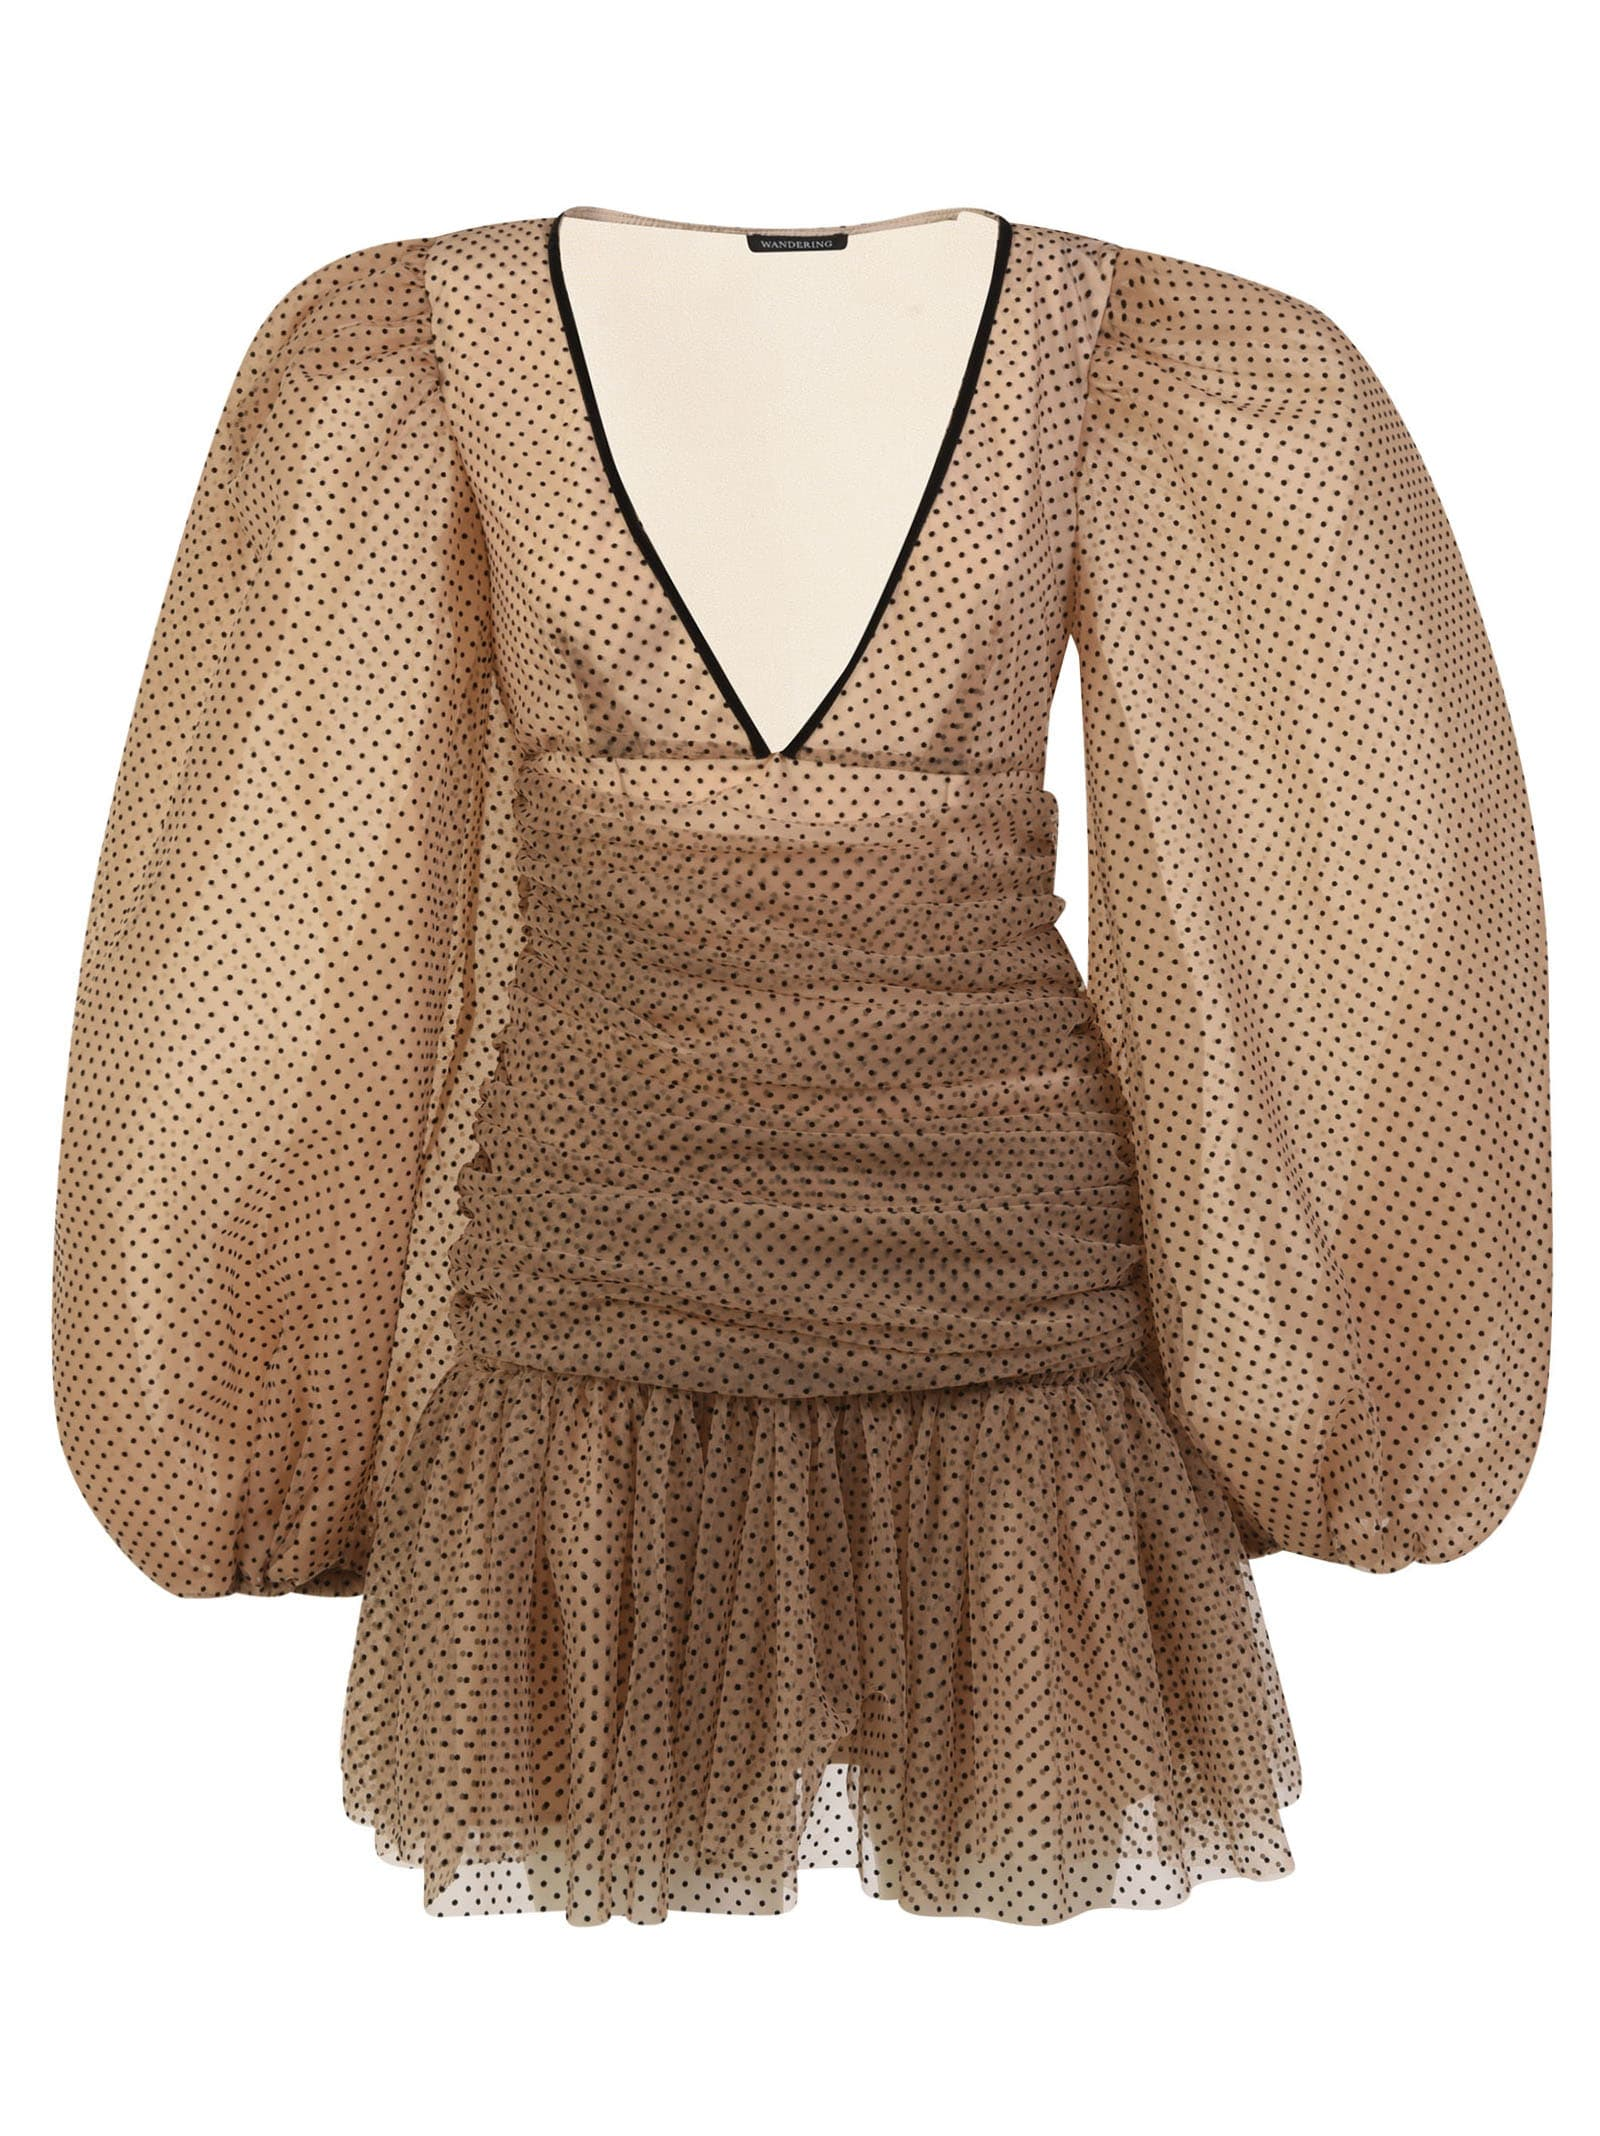 Buy WANDERING Polka Dot Mini Dress online, shop WANDERING with free shipping